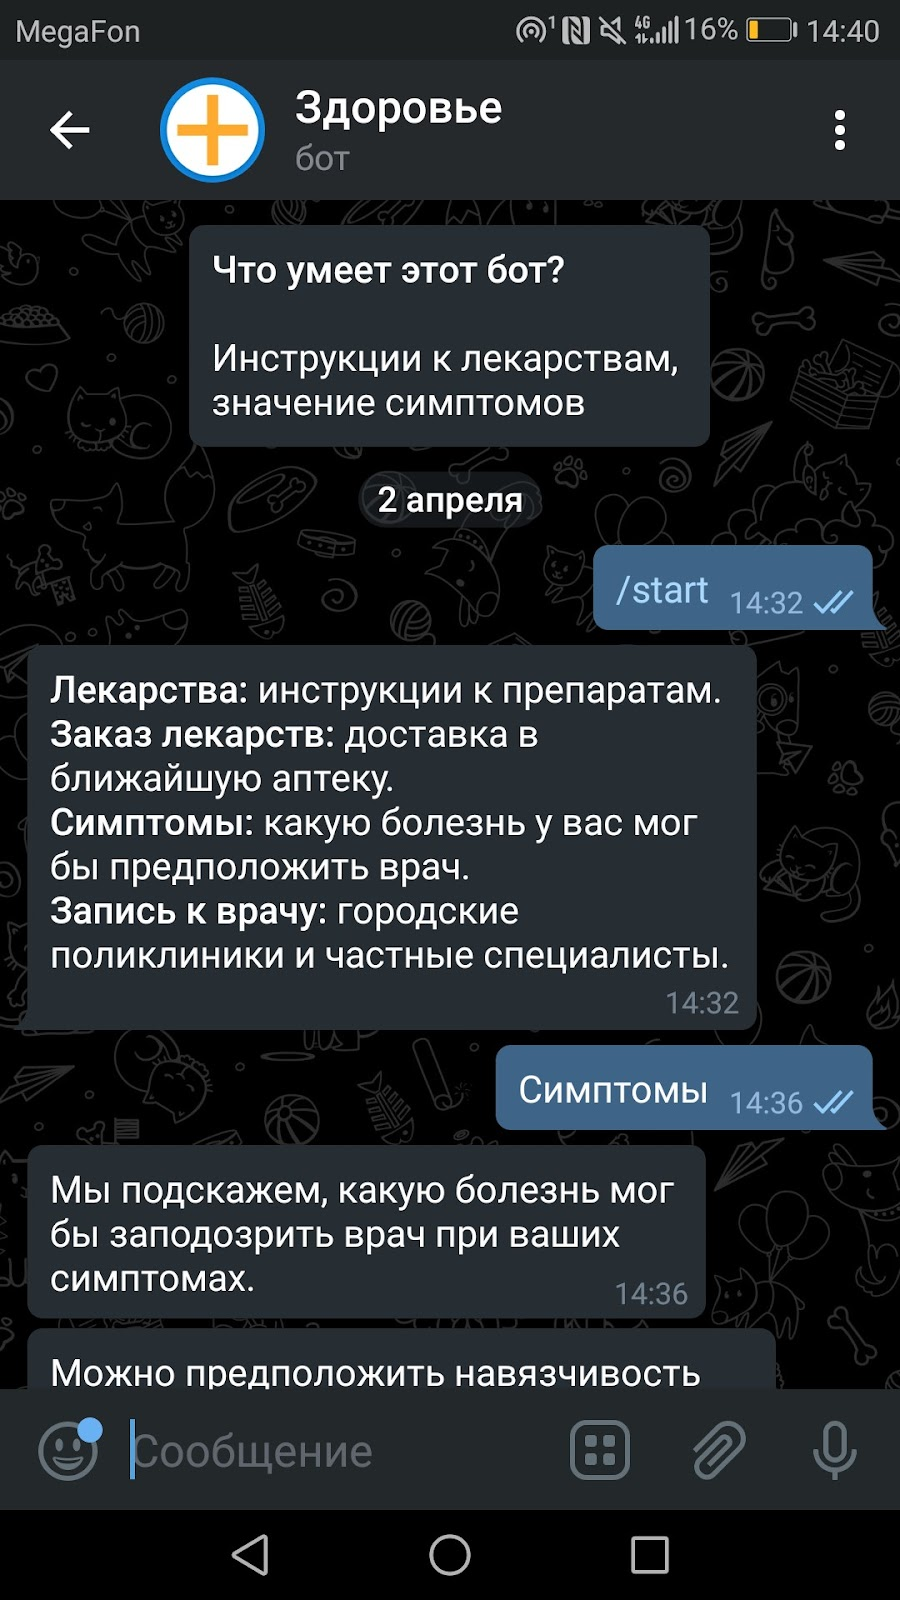 @zdorobot